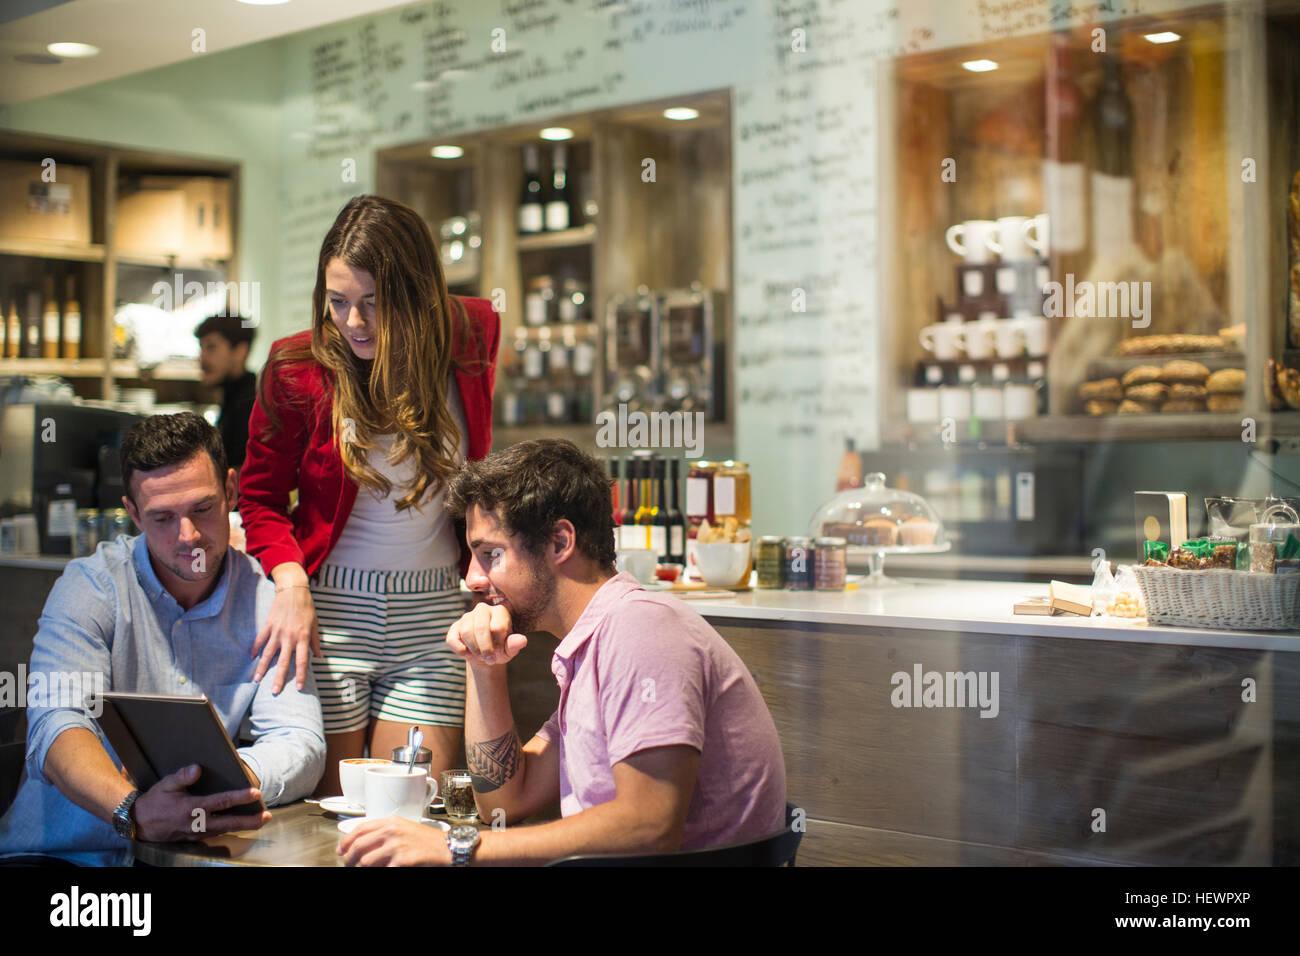 Maschio e femmina di amici in cafe guardando a tavoletta digitale Immagini Stock